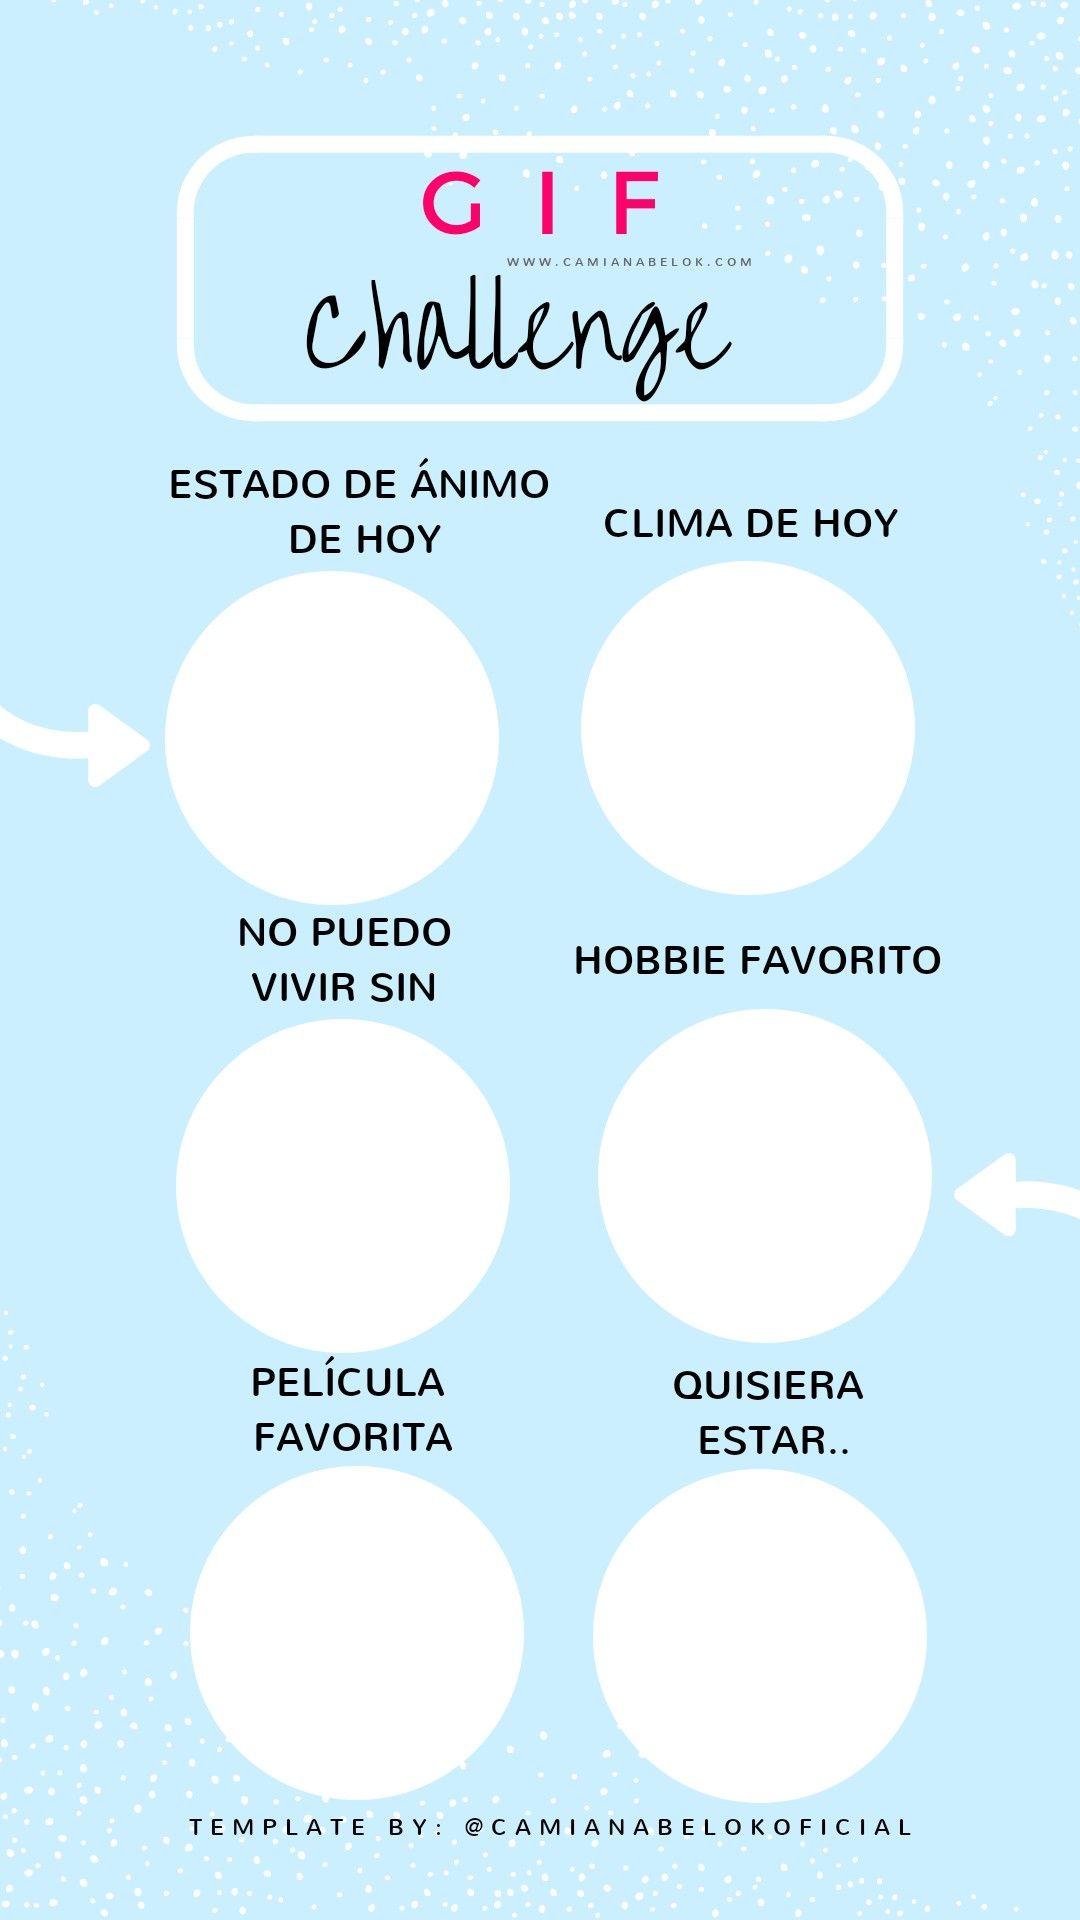 Gif Challenge Español Spanish Story Games Instagram Template Stories Historias Retos Para Instagram Juegos Para Instagram Preguntas Para Whatsapp